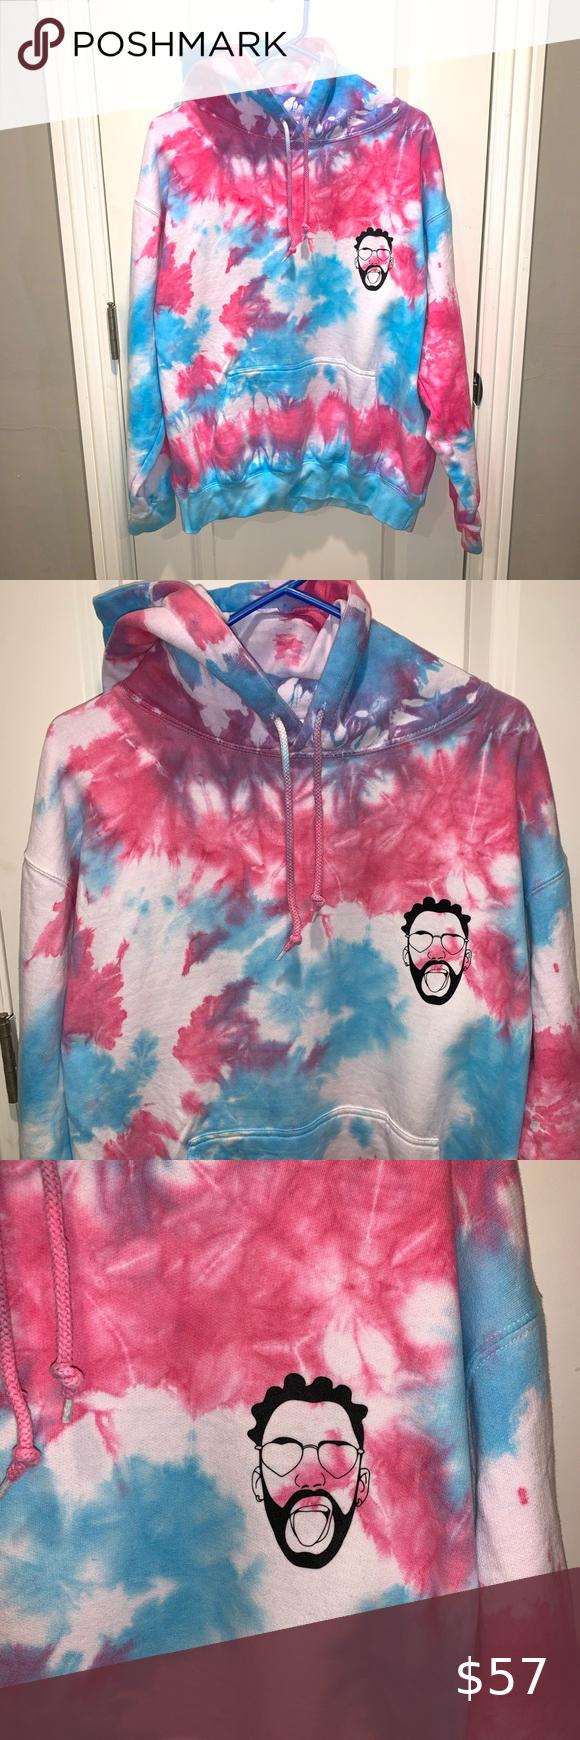 Bad Bunny Tie Dye Hoodie In 2021 Tie Dye Hoodie Tie Dye Graphic Crew Neck Sweatshirts [ 1740 x 580 Pixel ]